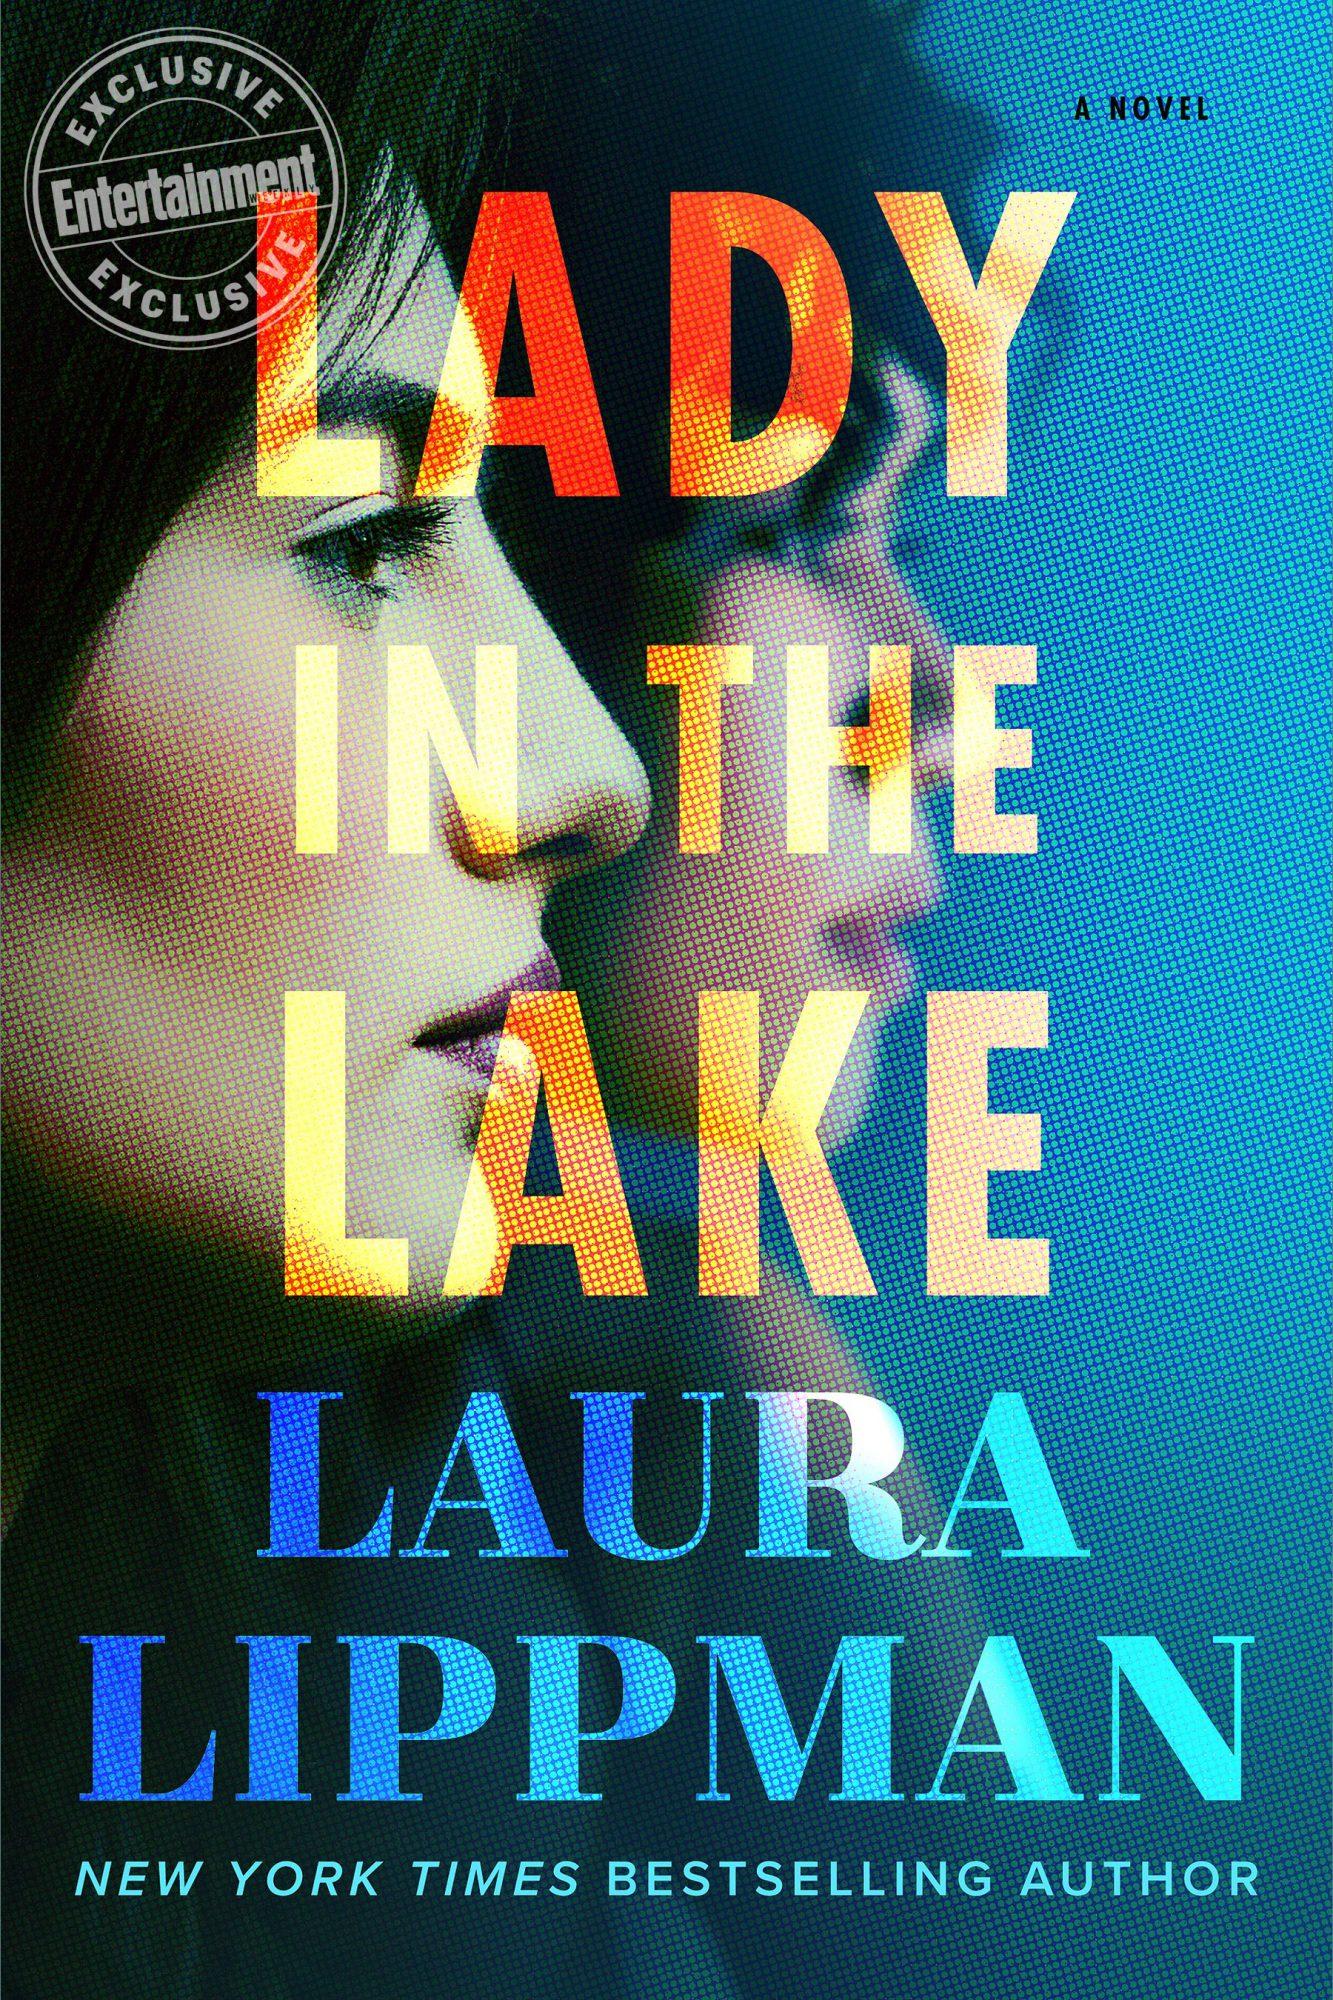 Laura Lippman Lady in the LakeCredit: Harper Collins